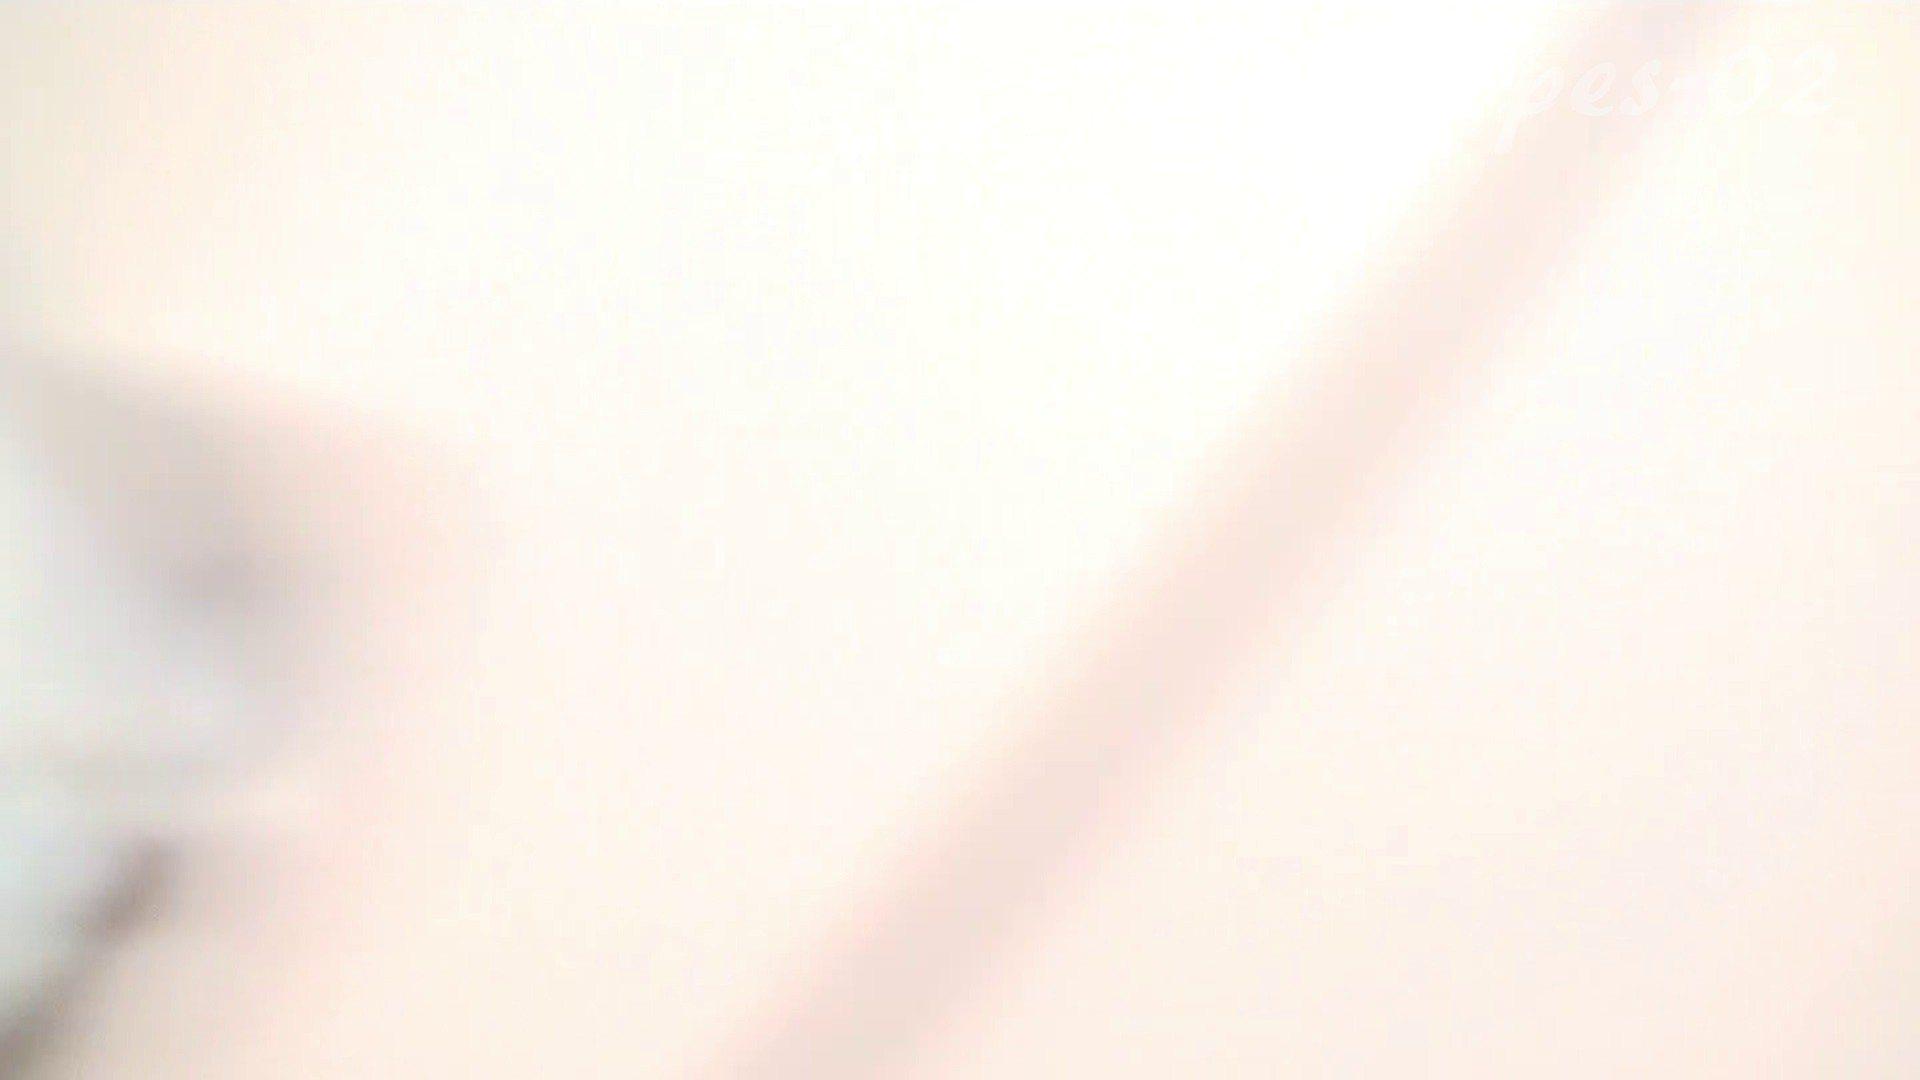 ※100個限定販売 至高下半身盗撮-プレミアム-【体育館編】VOL.2 体育館 SEX無修正画像 63画像 39